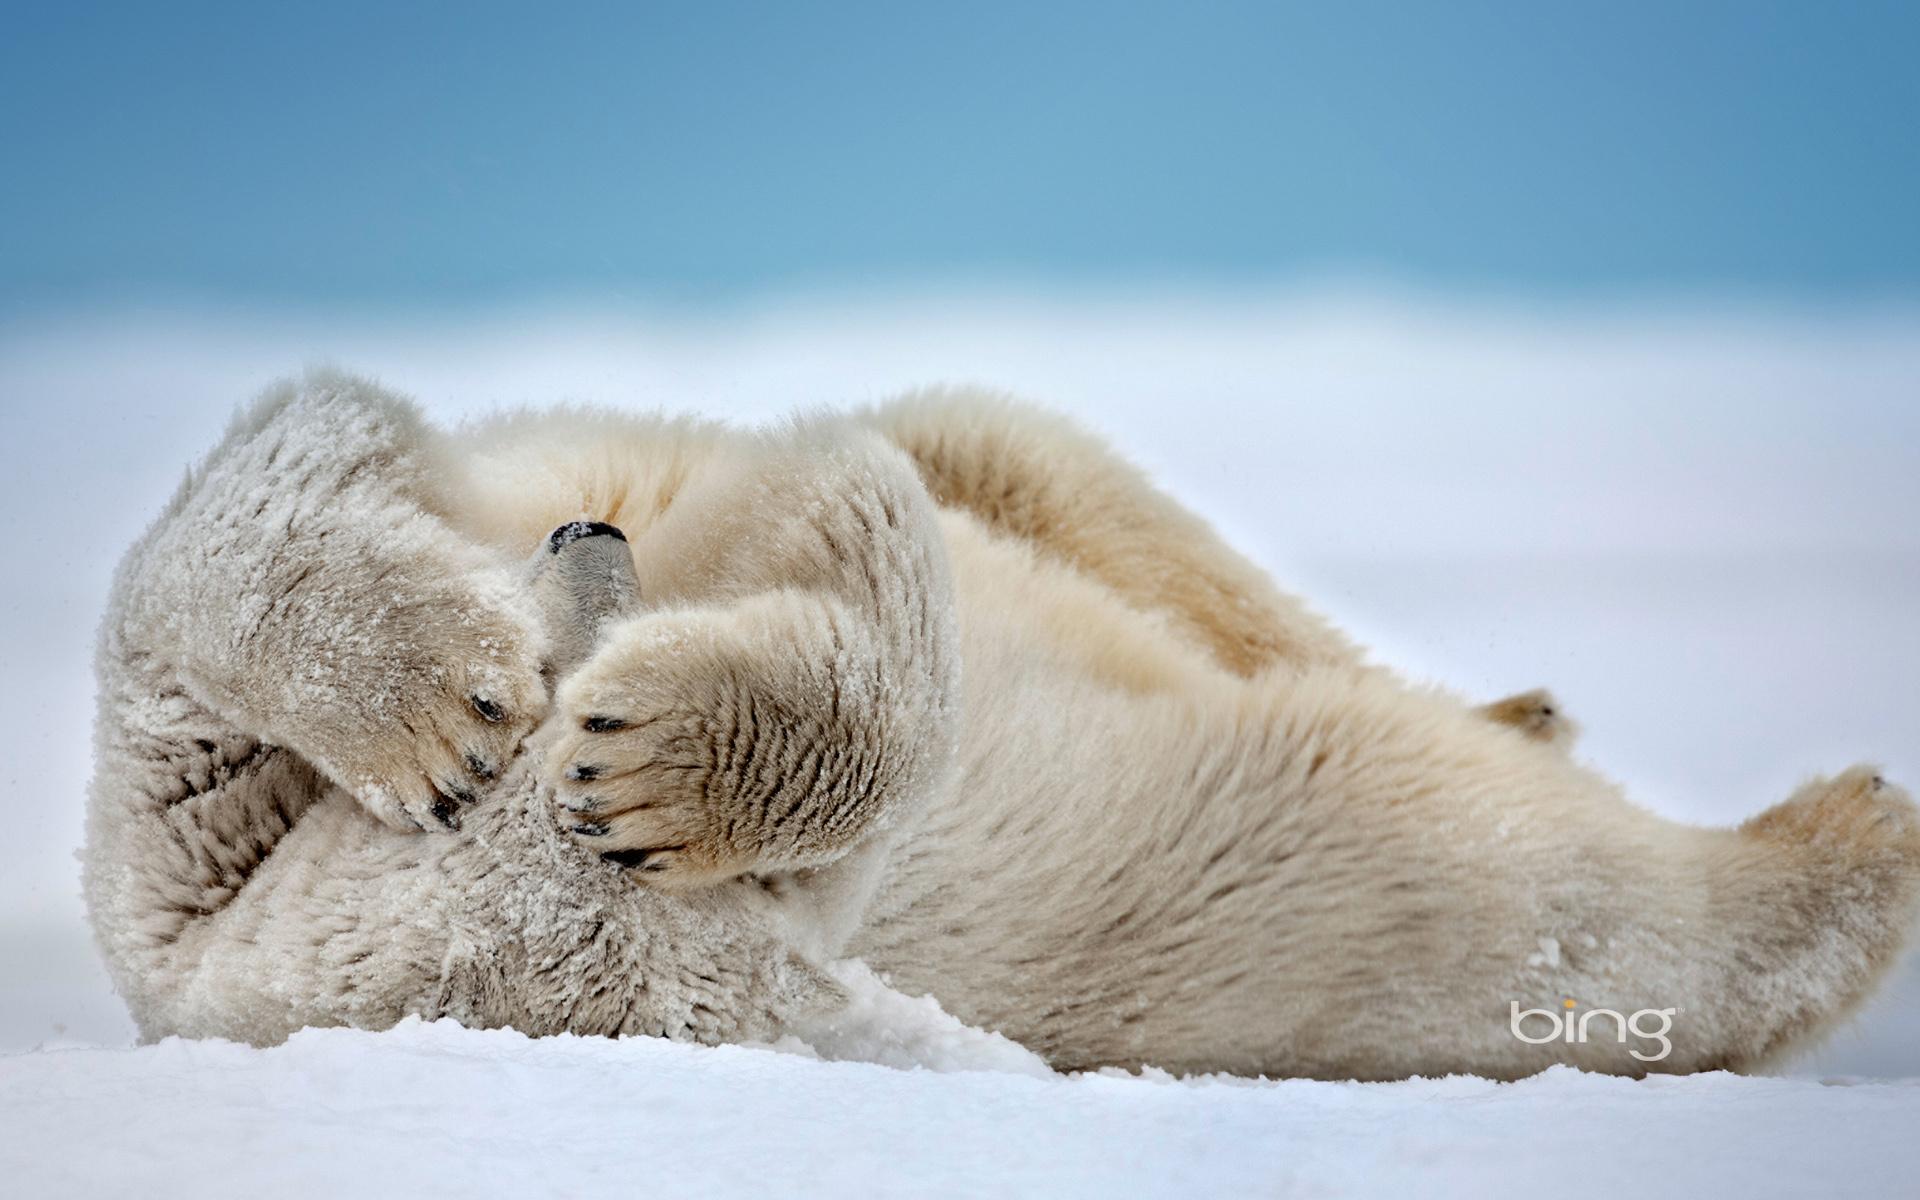 polar bear full hd wallpaper and background image | 1920x1200 | id